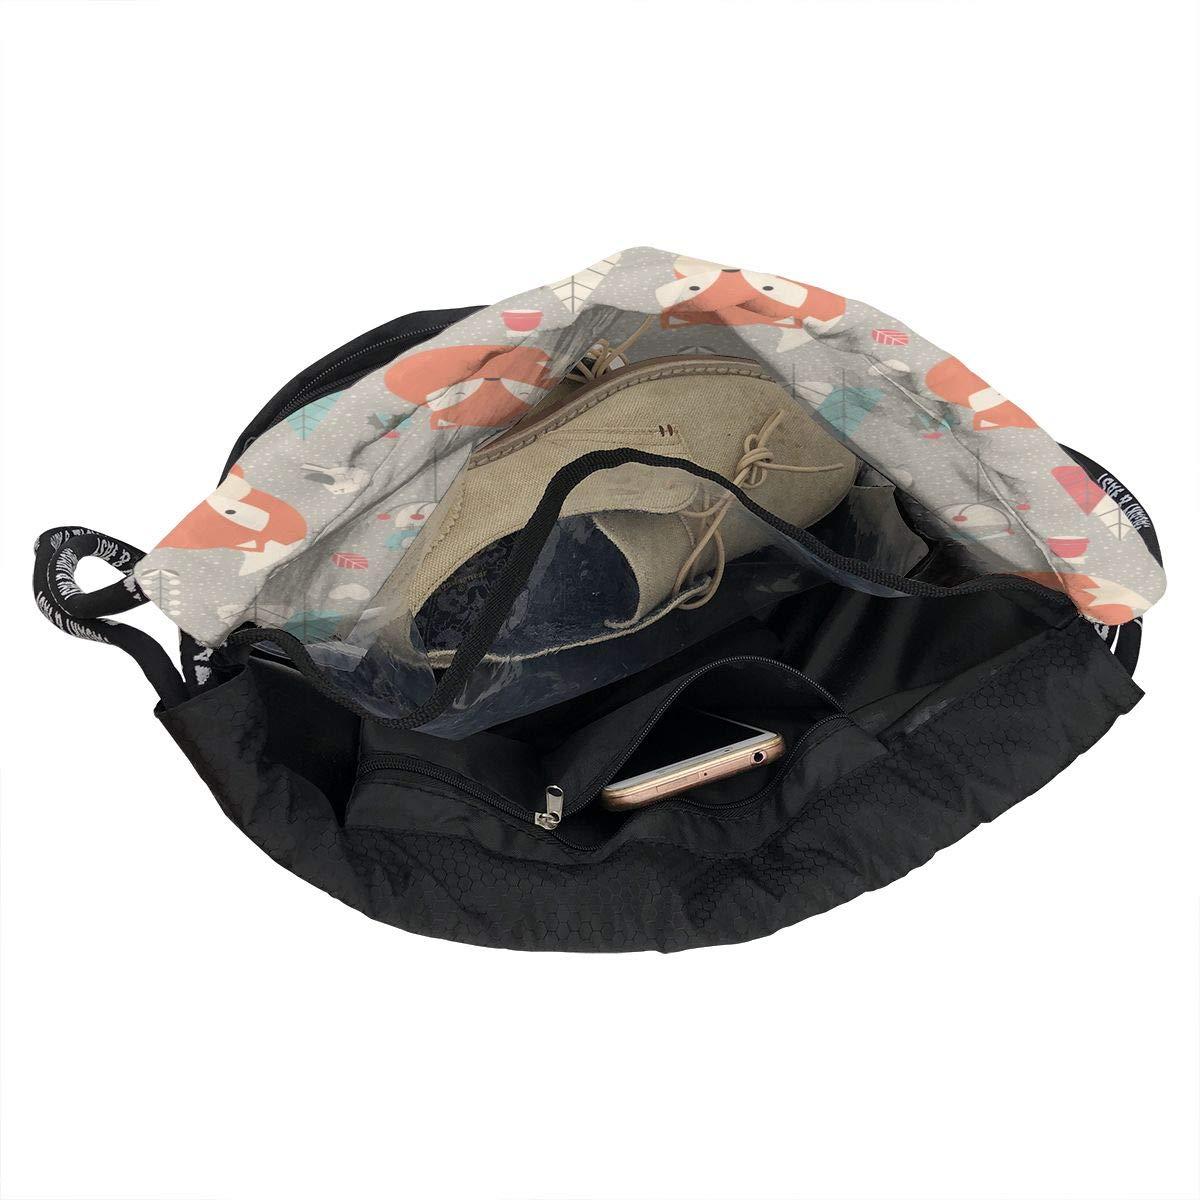 Zol1Q Fox Trees Drawstring Bag for Men /& Women Large Storage Waterproof Cinch Backpack Sackpack Tote Sack for Gym Travel